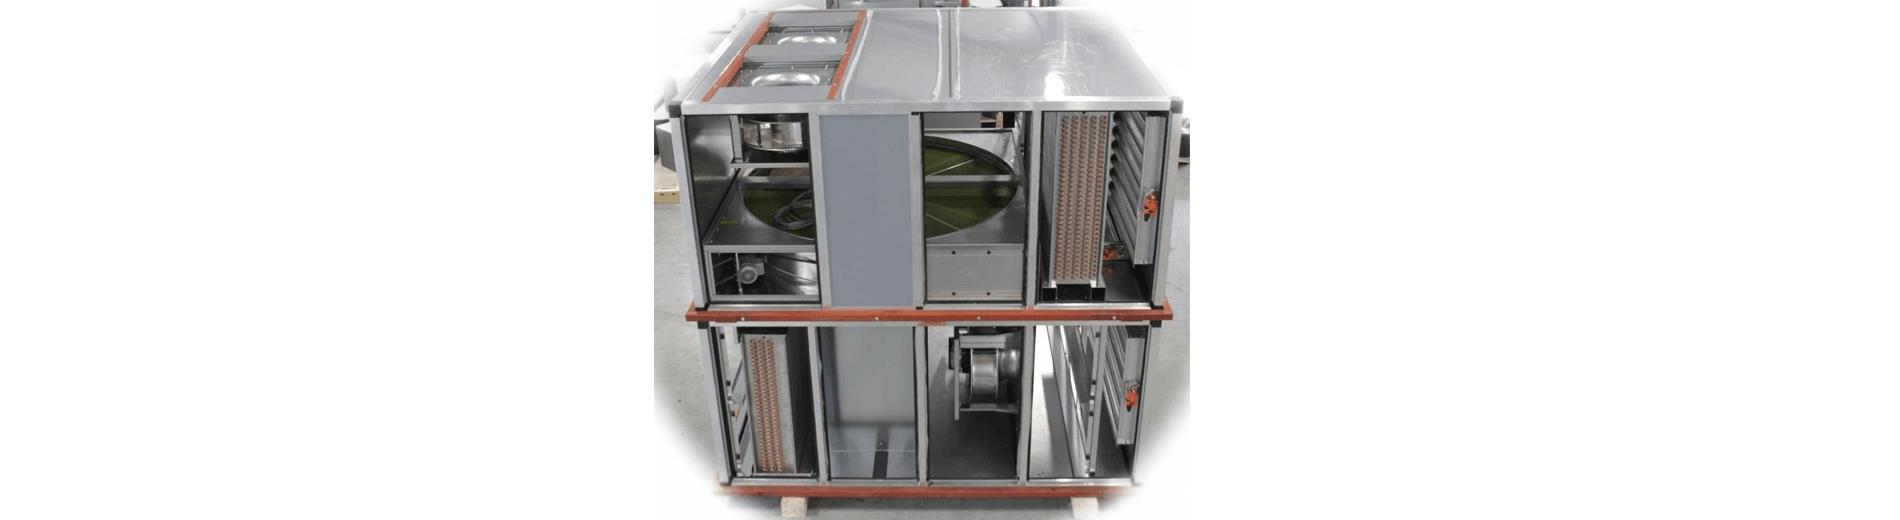 Package Air Handlers CRAC/CRAH Replacement